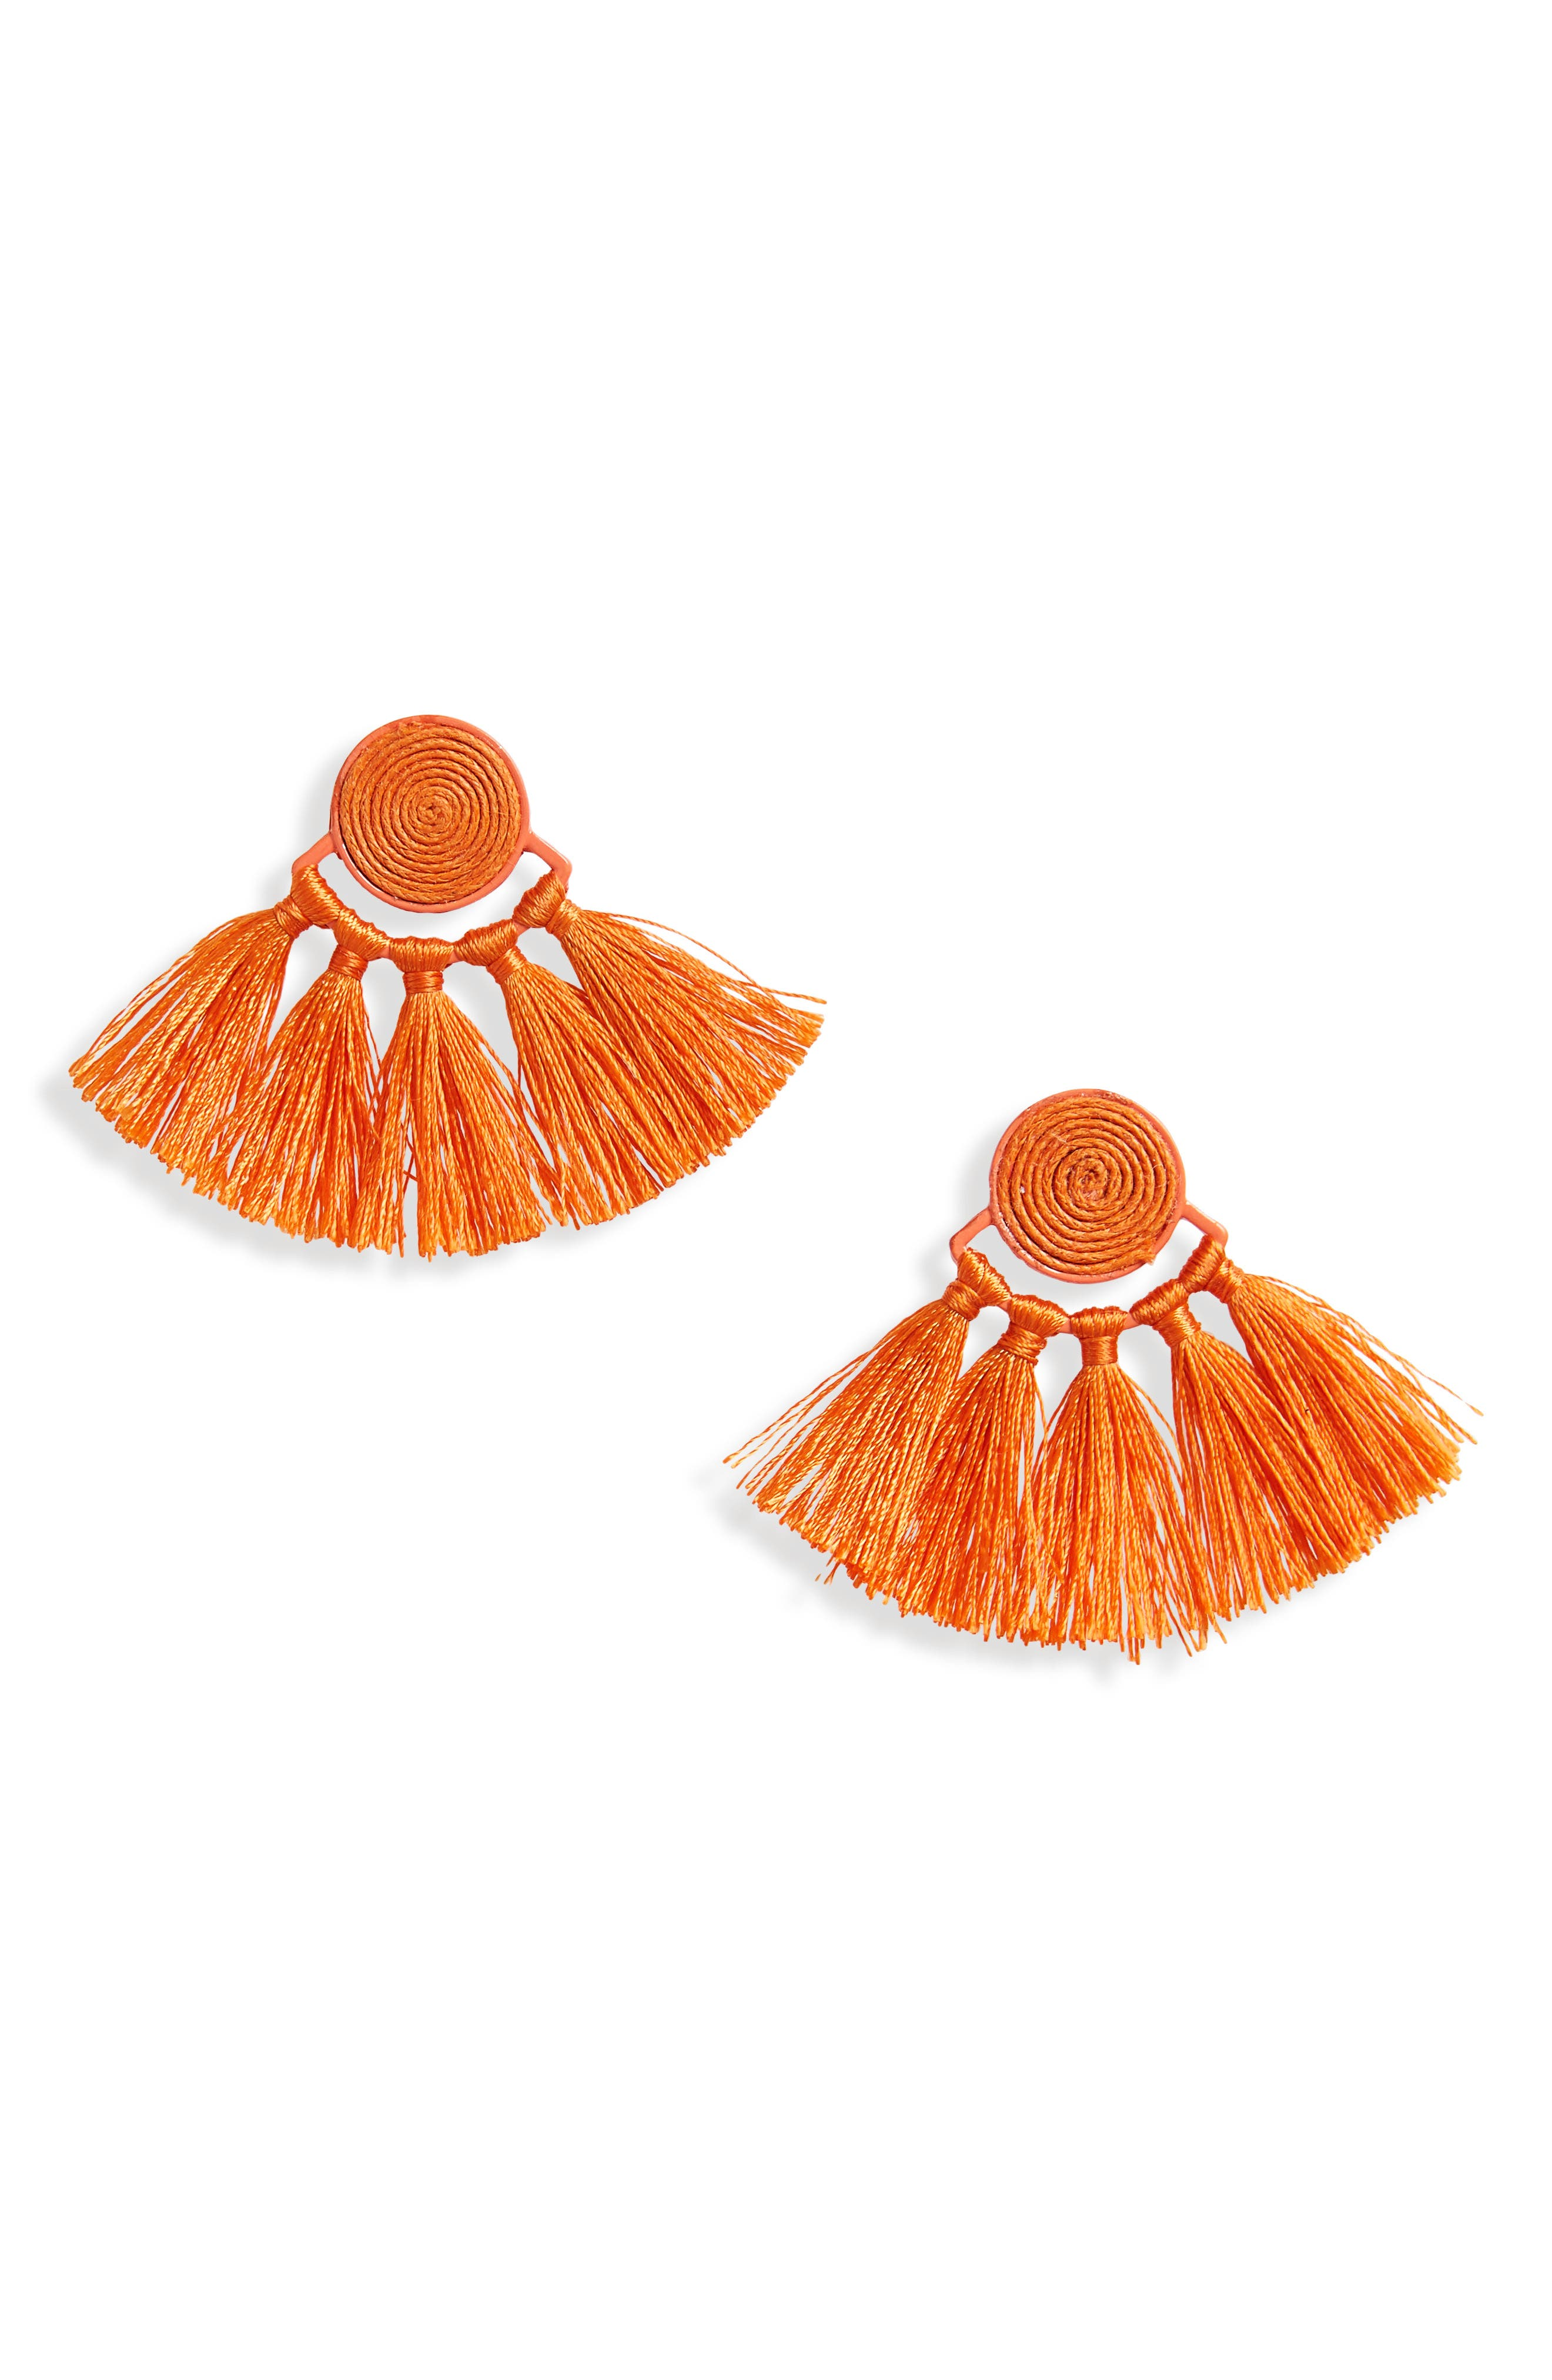 Swirl Tassel Earrings,                             Main thumbnail 1, color,                             Orange